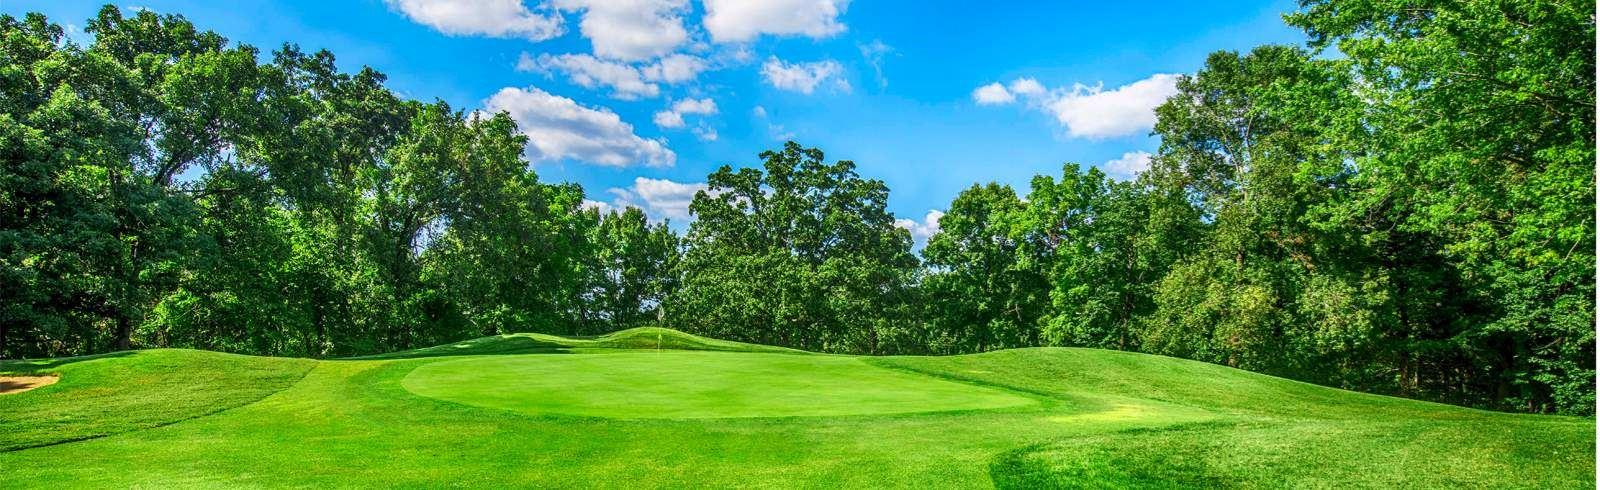 Golf At Osage Beach Missouri